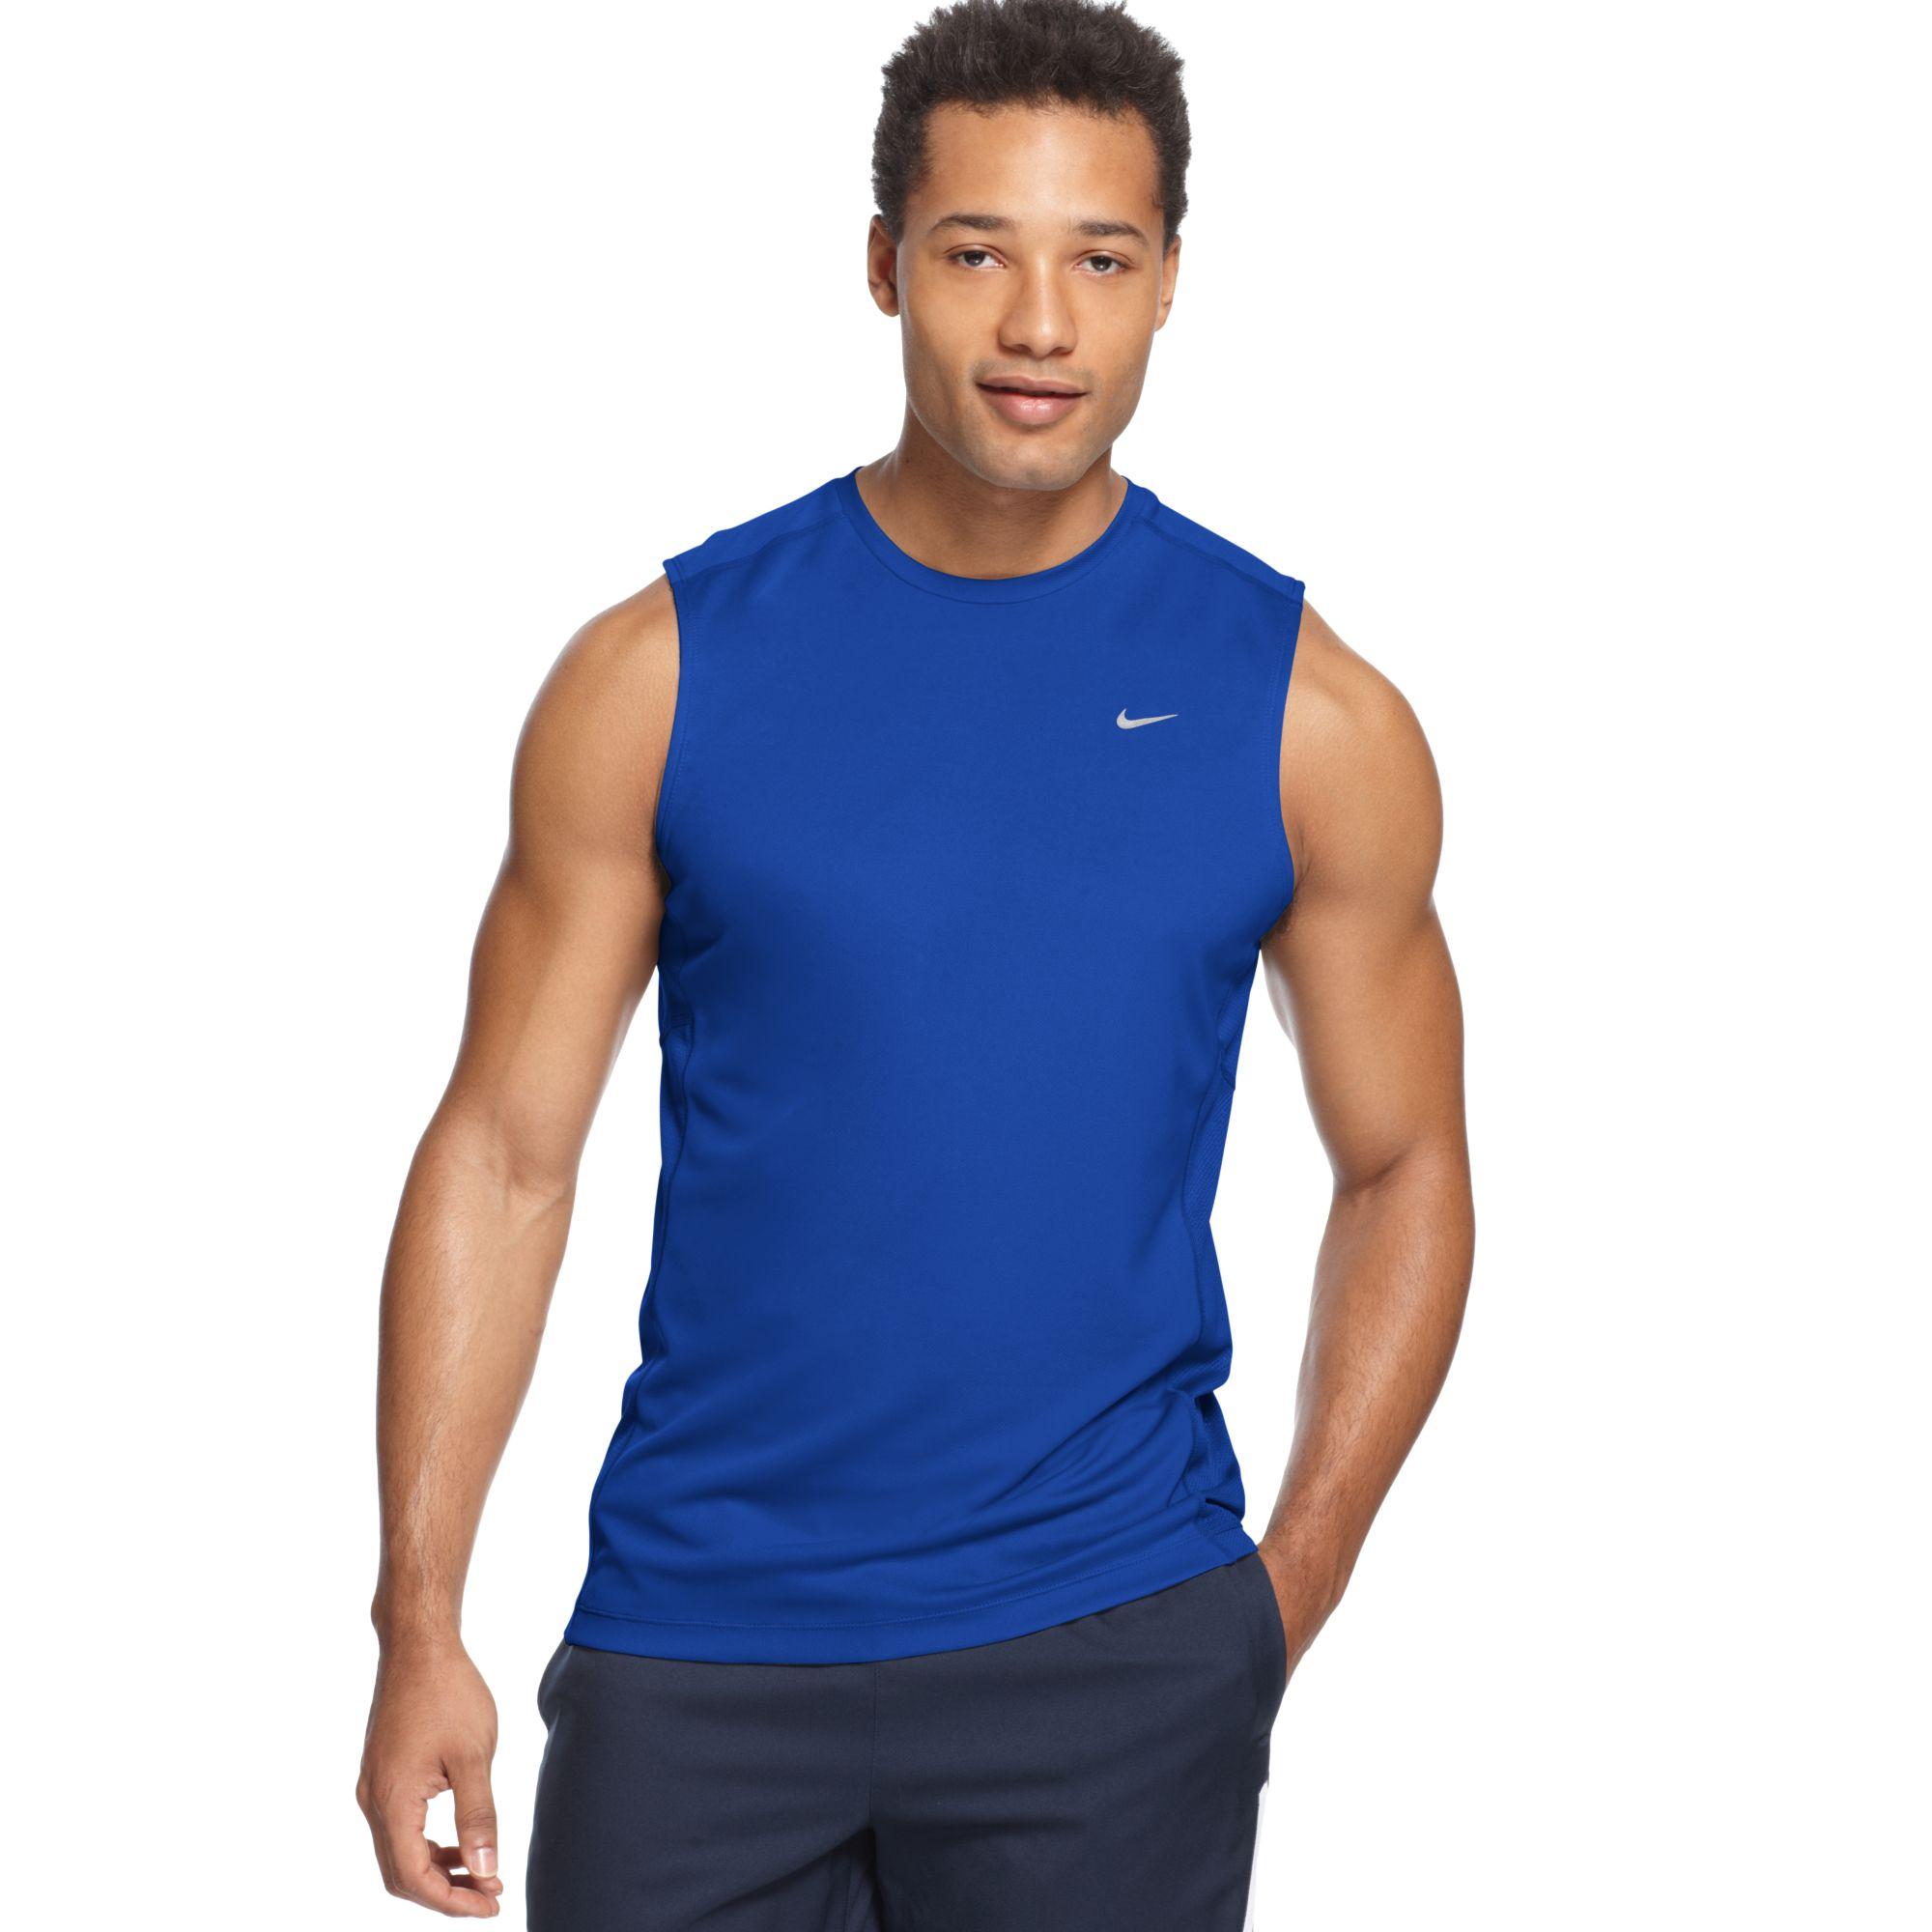 4c2efb9ce Nike Dri Fit Sleeveless Running Shirt - DREAMWORKS